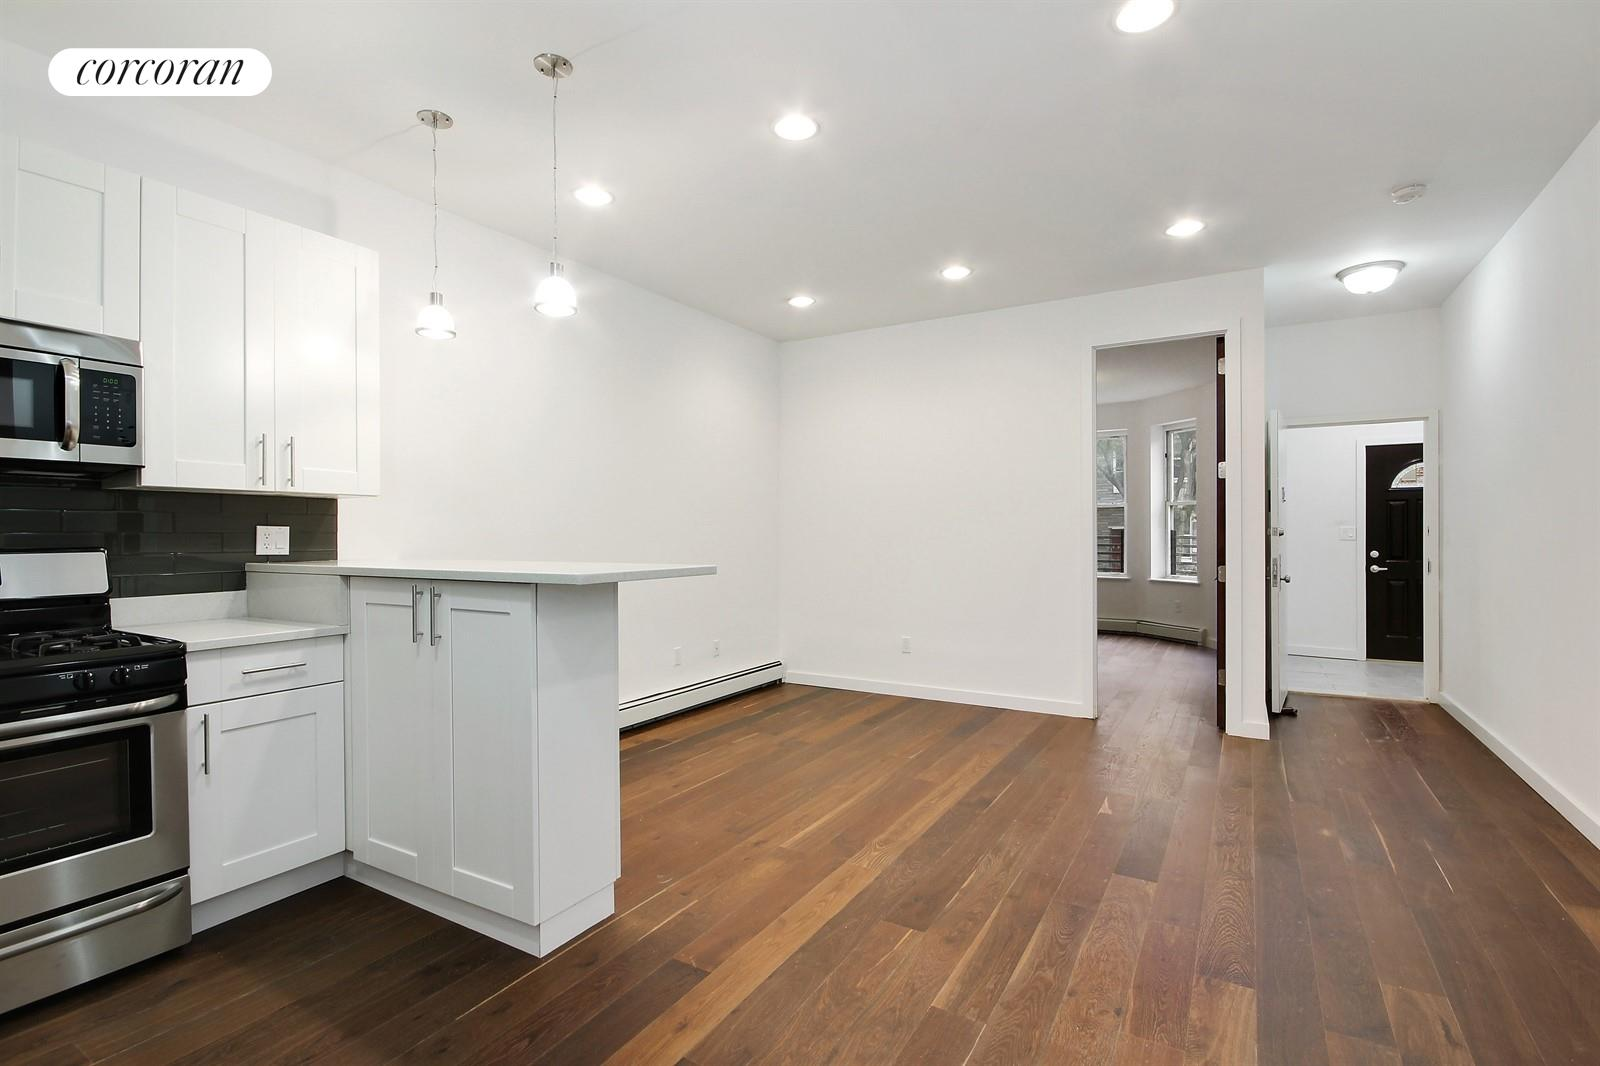 Corcoran, 298 Weirfield Street, Apt. 2, Bushwick Rentals, Brooklyn ...